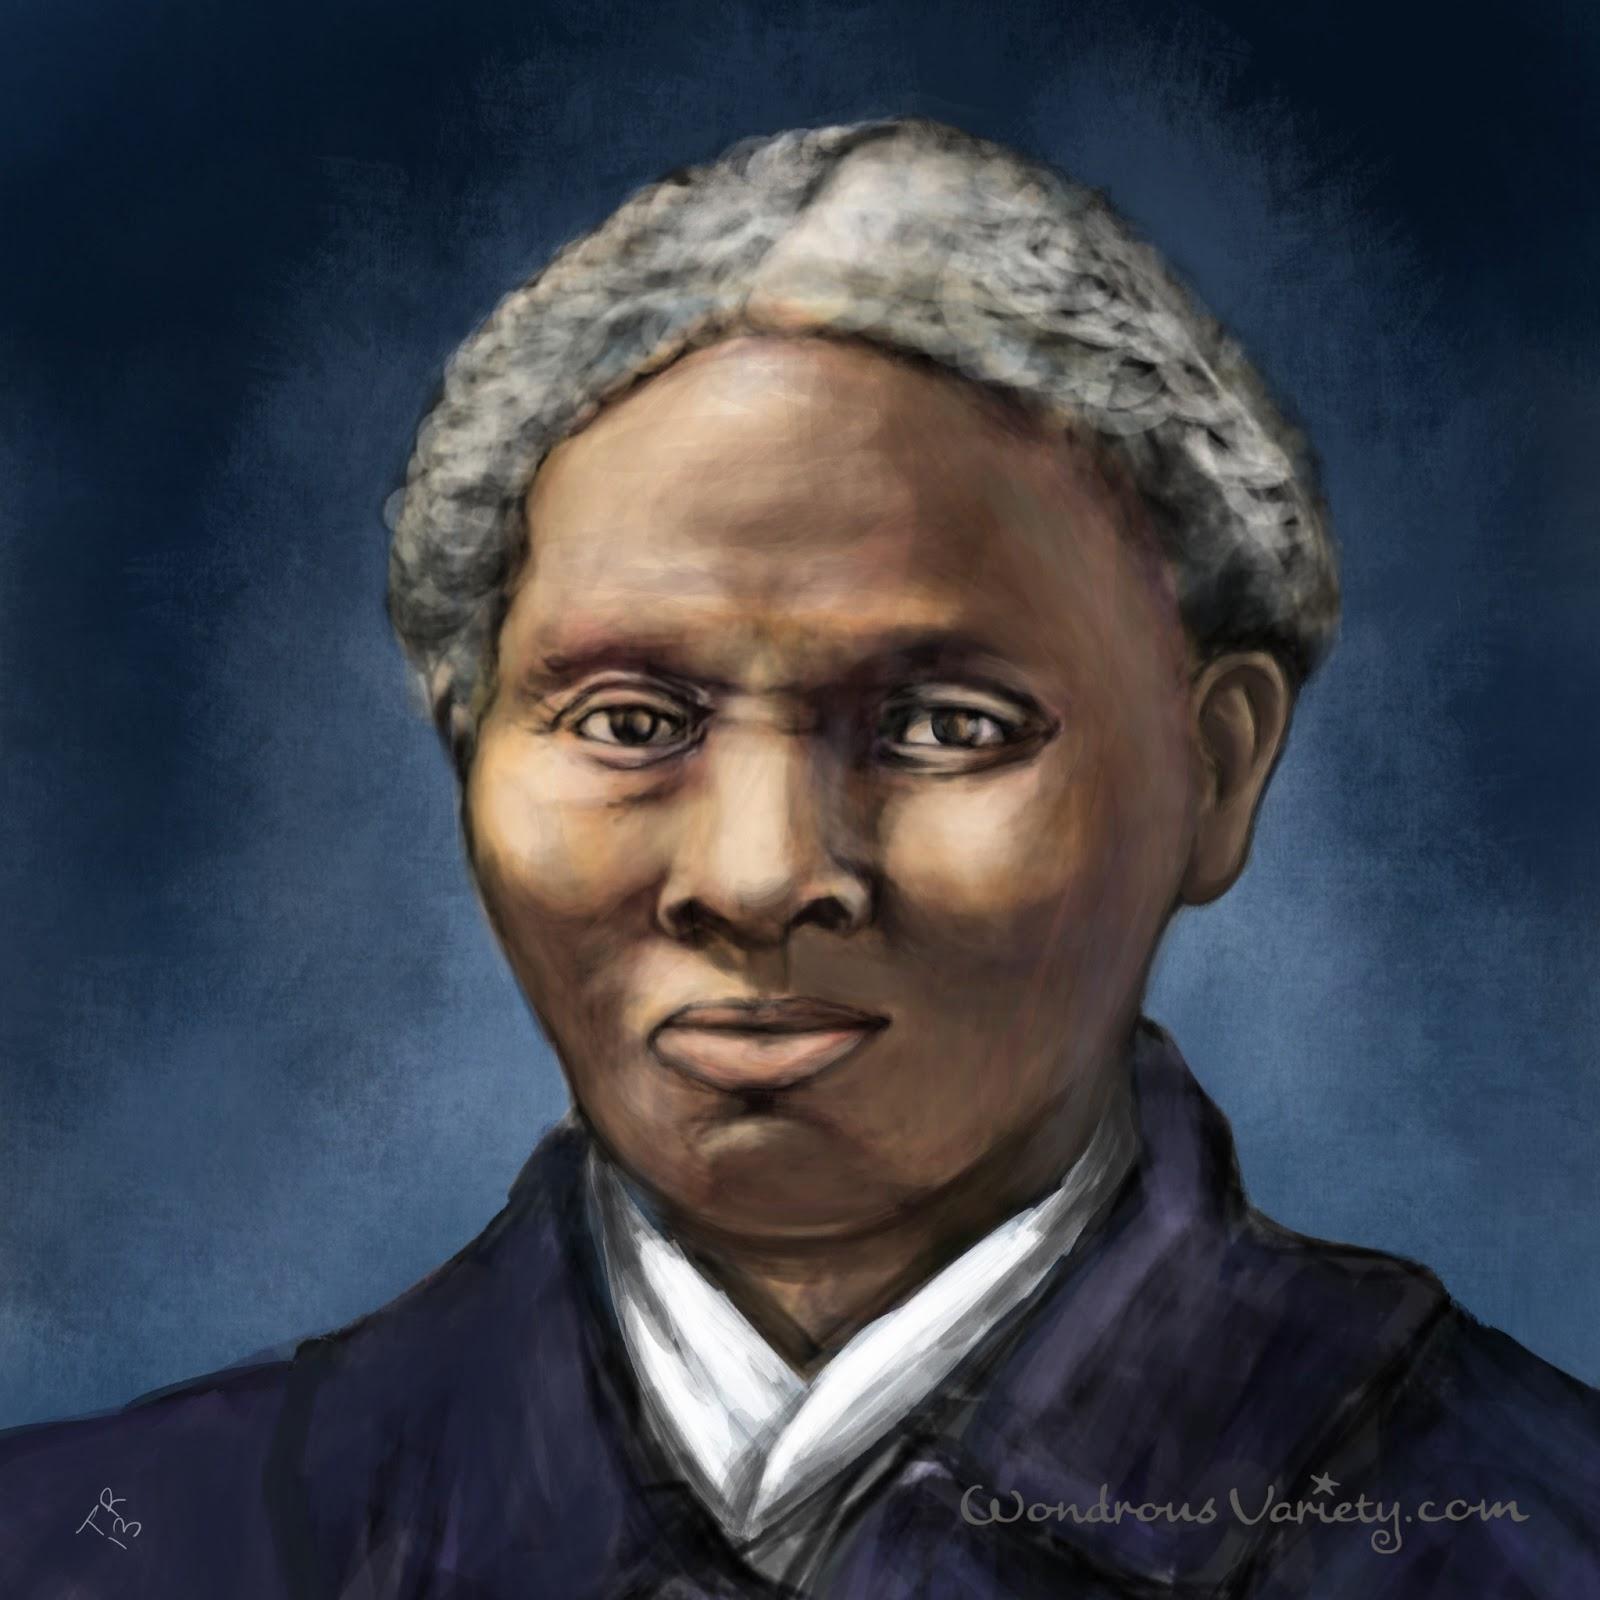 Wondrous Variety Blog Thank You Harriet Tubman